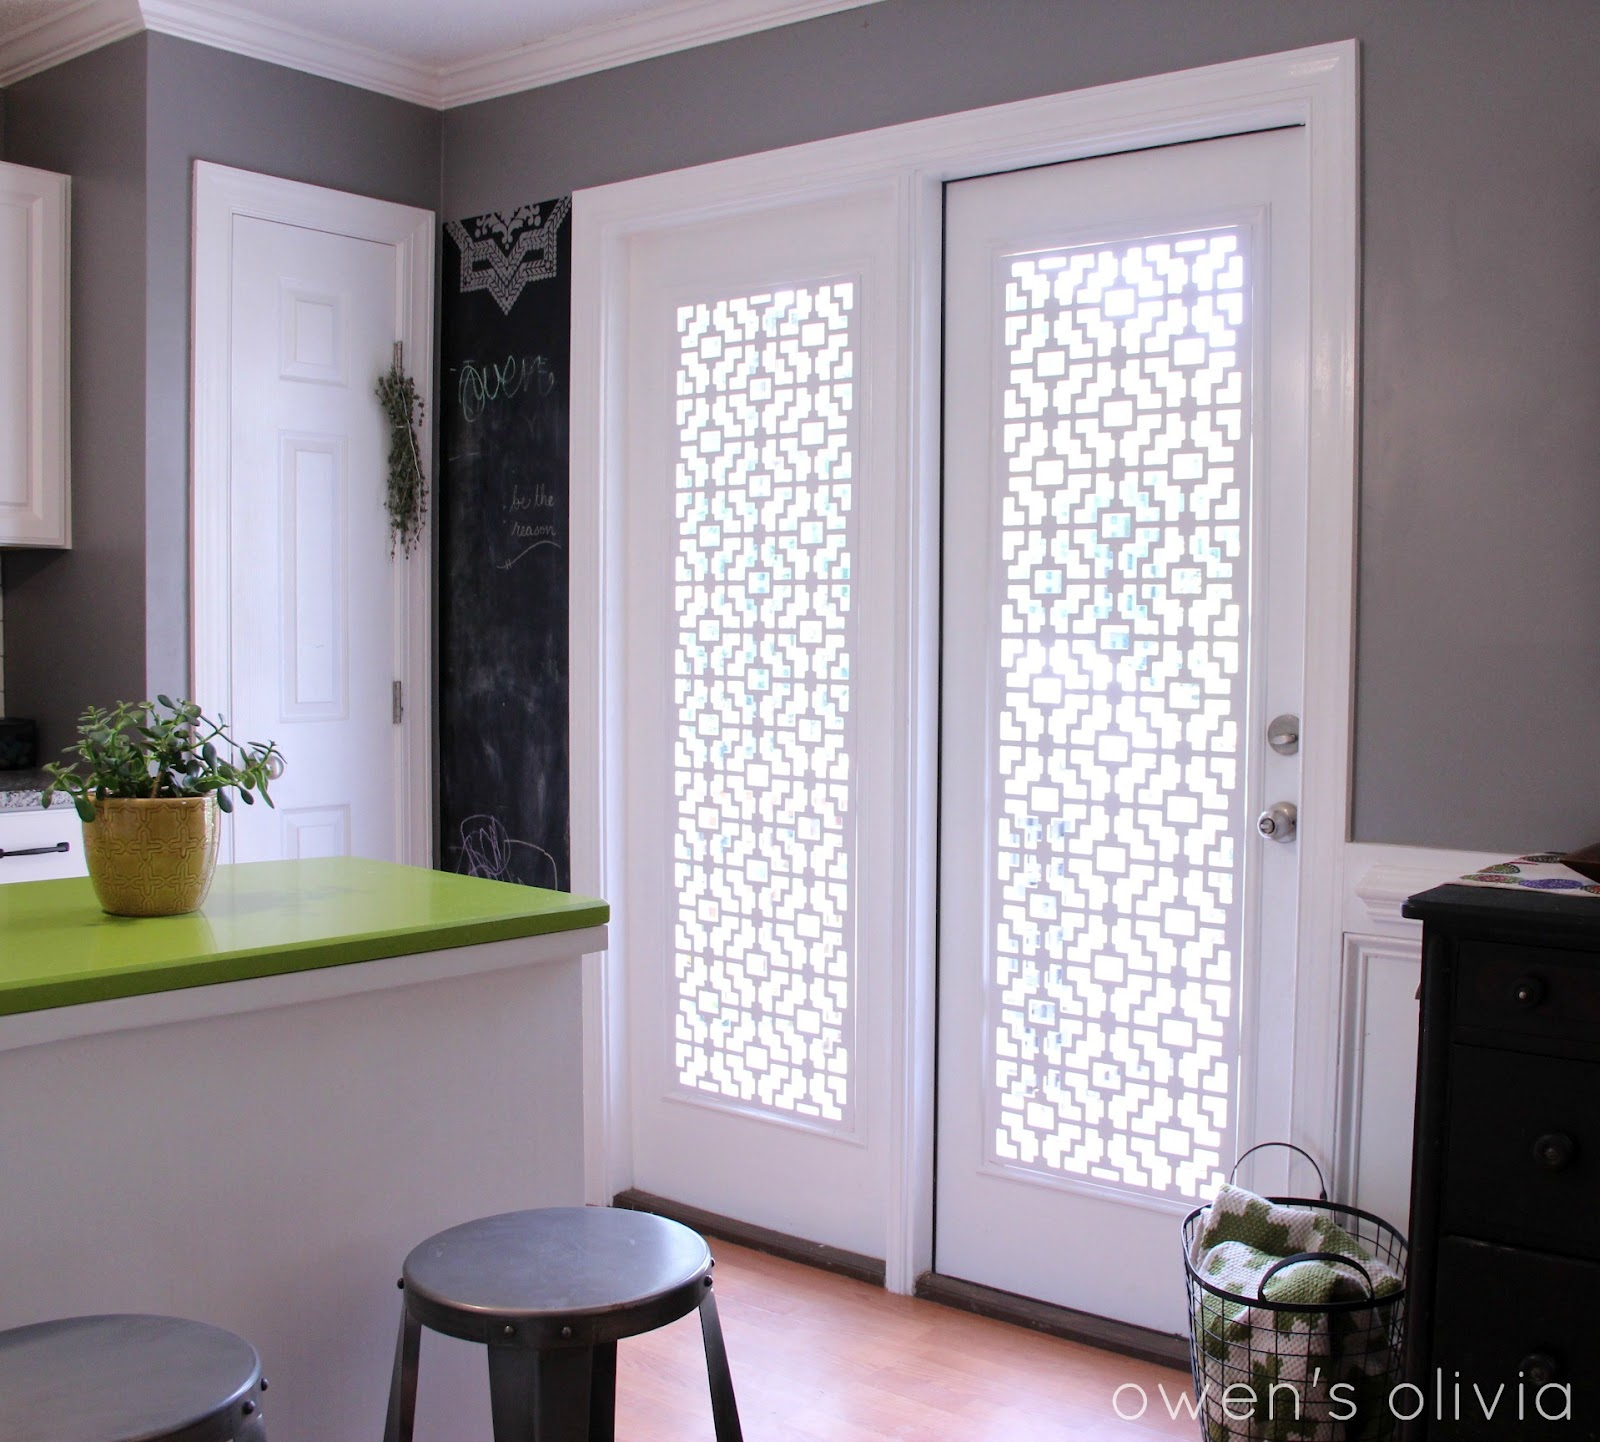 owens olivia Custom Window Treatments Using PVC